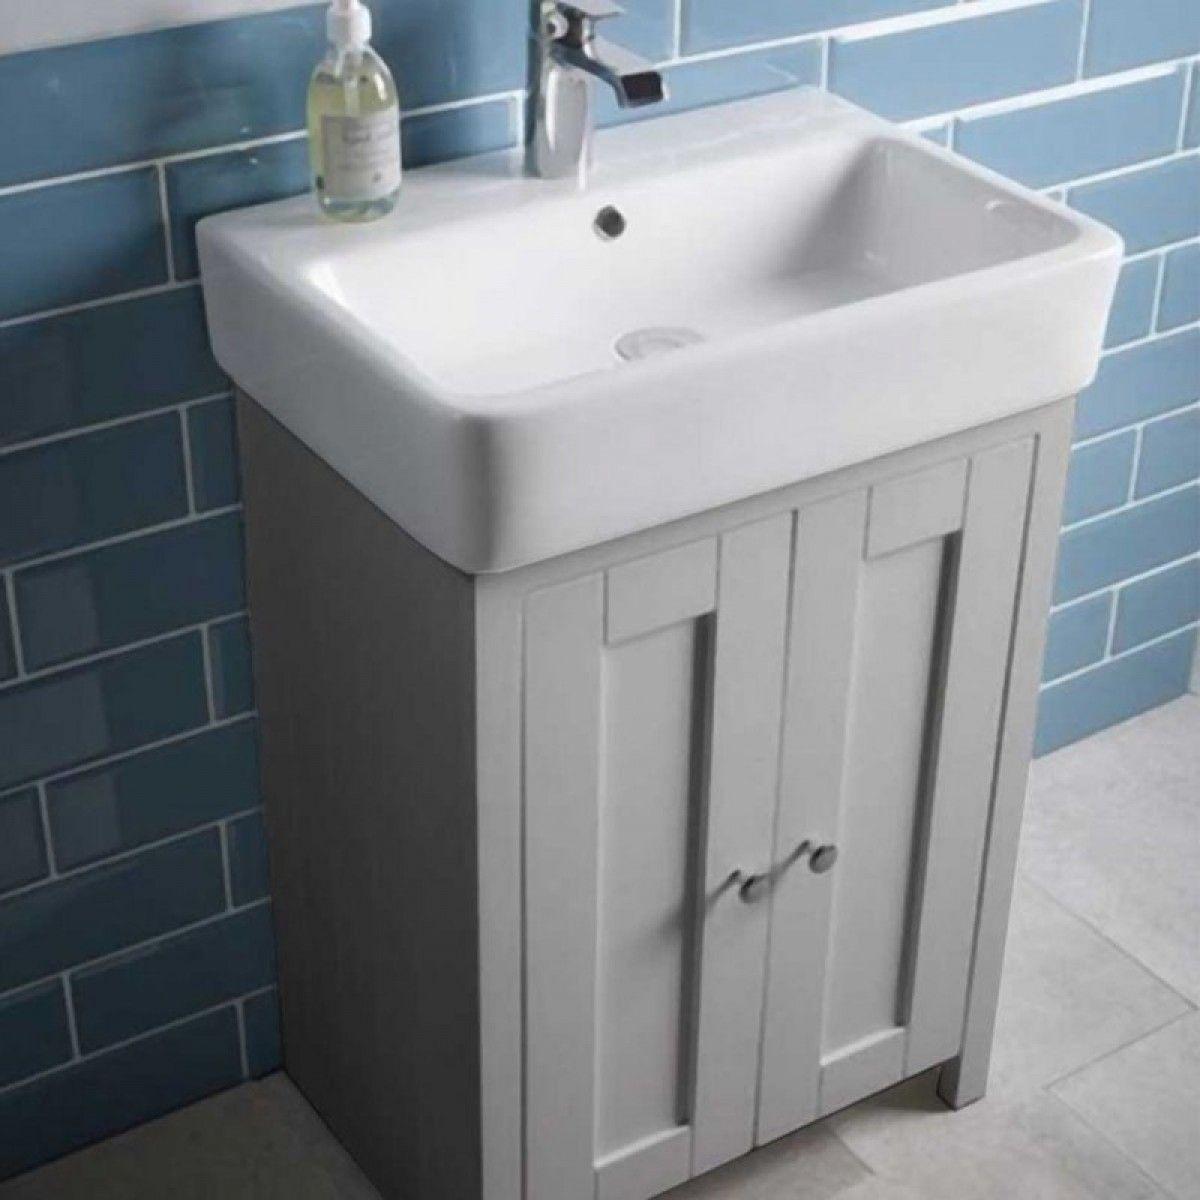 Tavistock Lansdown 550mm Floorstanding Vanity Unit Basin